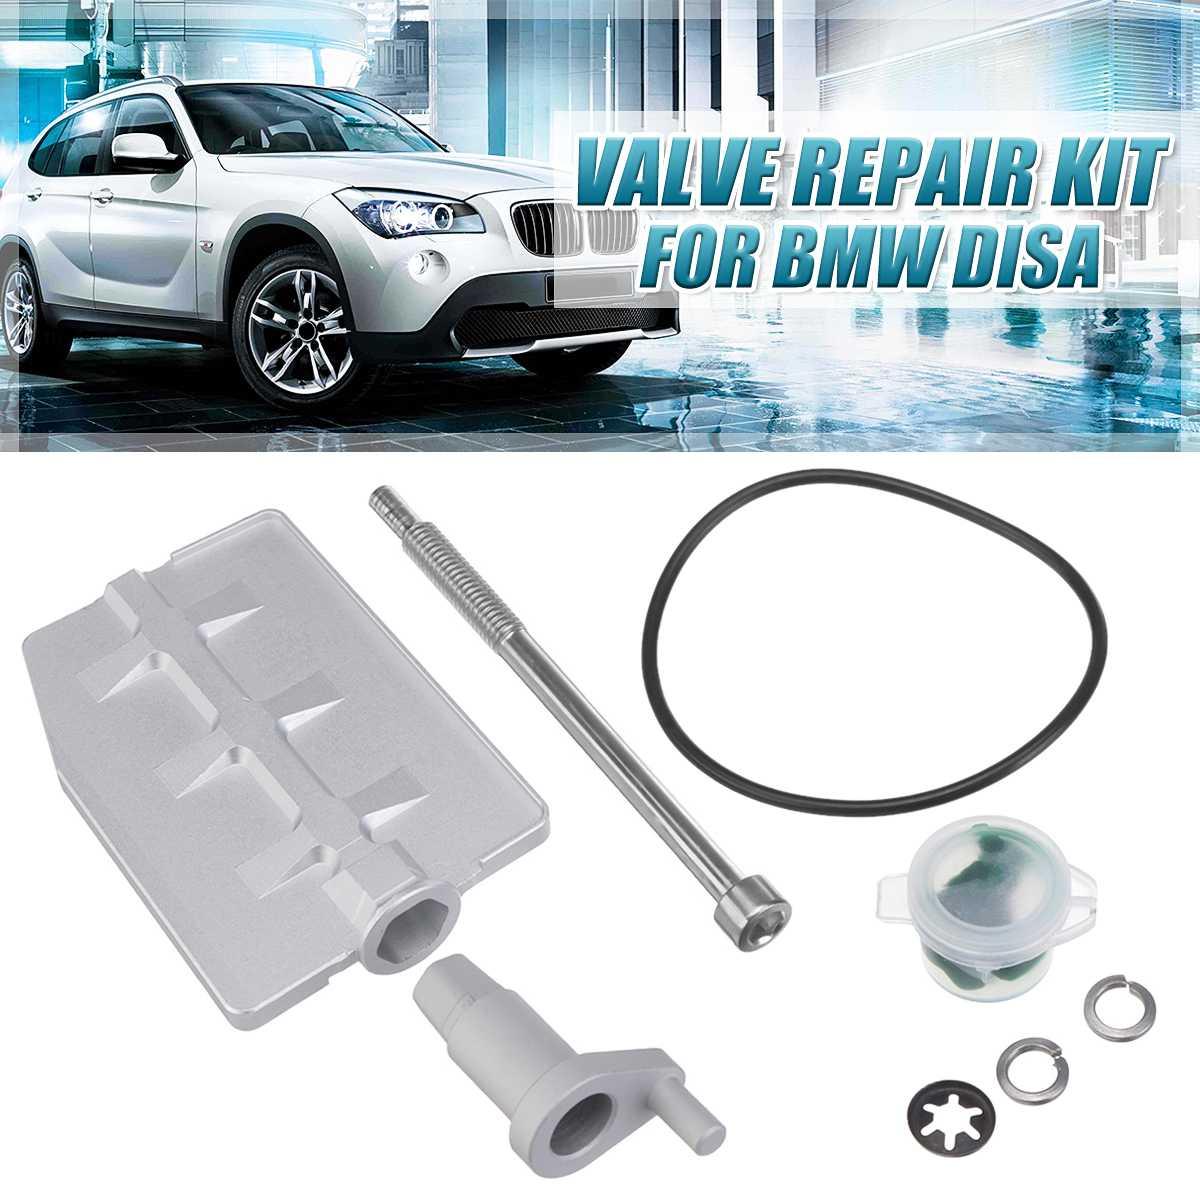 1 Set Engine Intake Manifold Valve Swirl Flap Repair Kit Rattle Aluminium Fix Overhaul For BMW Disa M54 3.0 Ltr 2.2 2.5